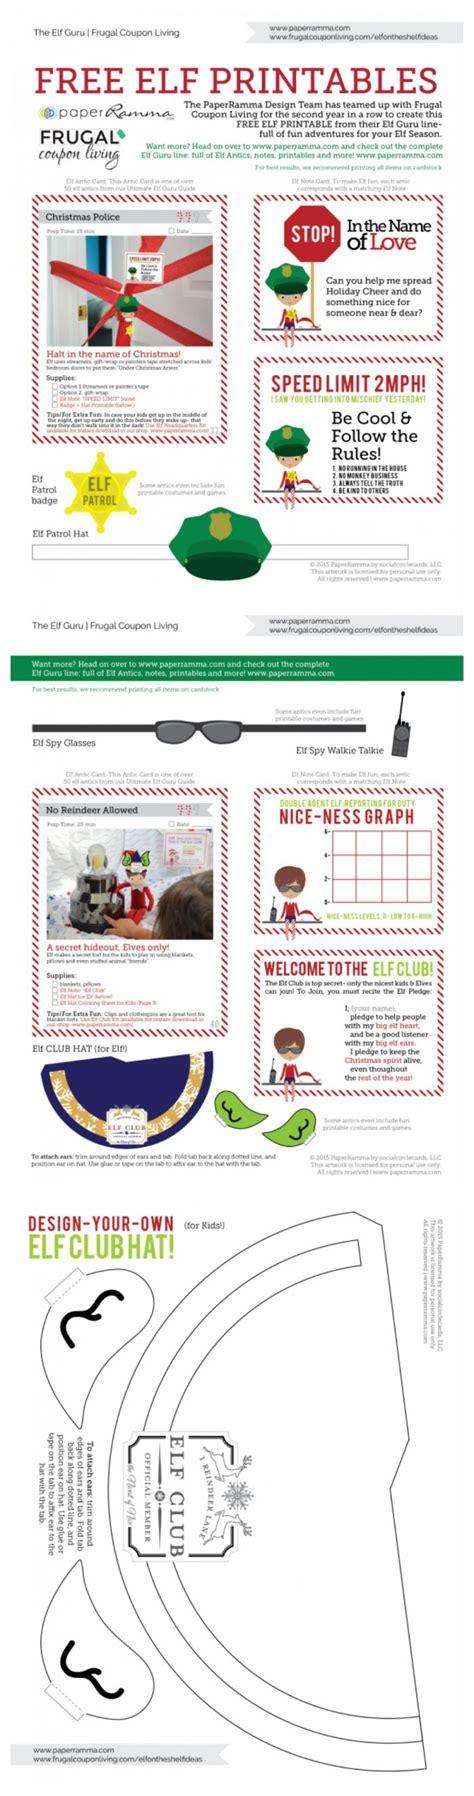 printable elf on the shelf twister elf on the shelf ideas elf twister printable